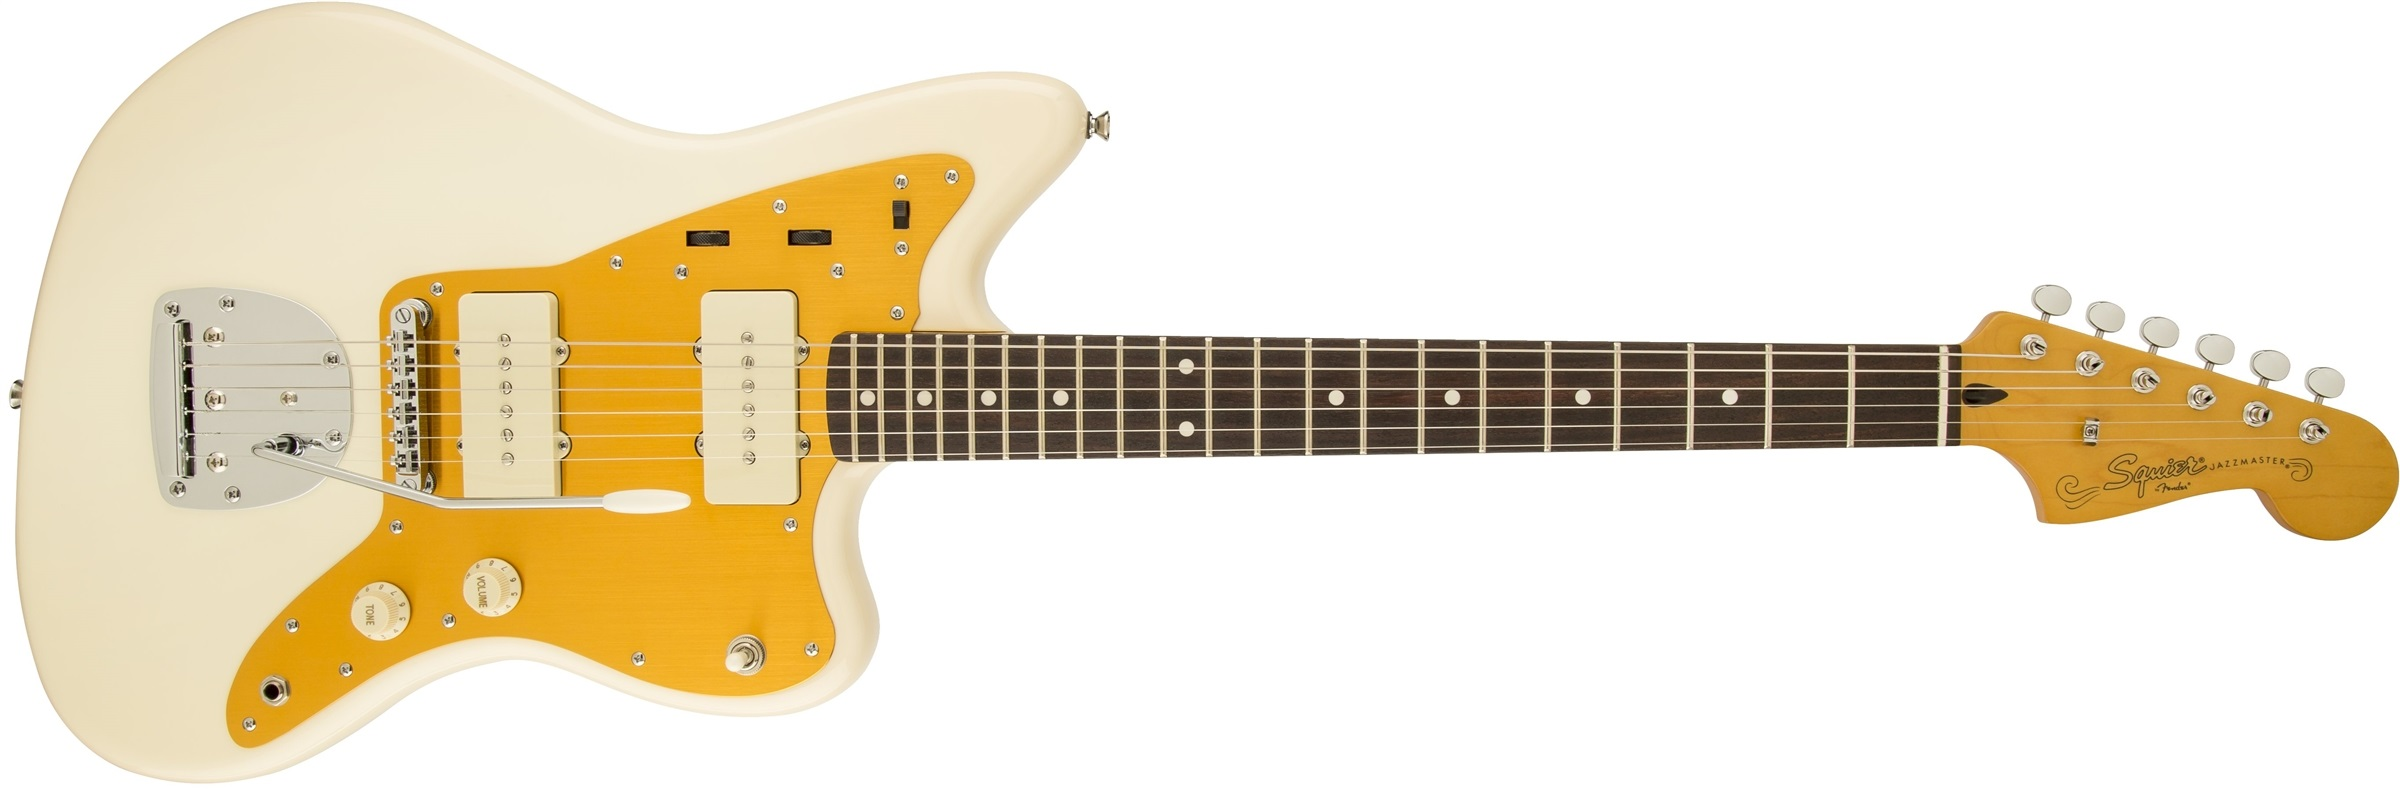 Fender Squier J Mascis Jazzmaster LRL VW